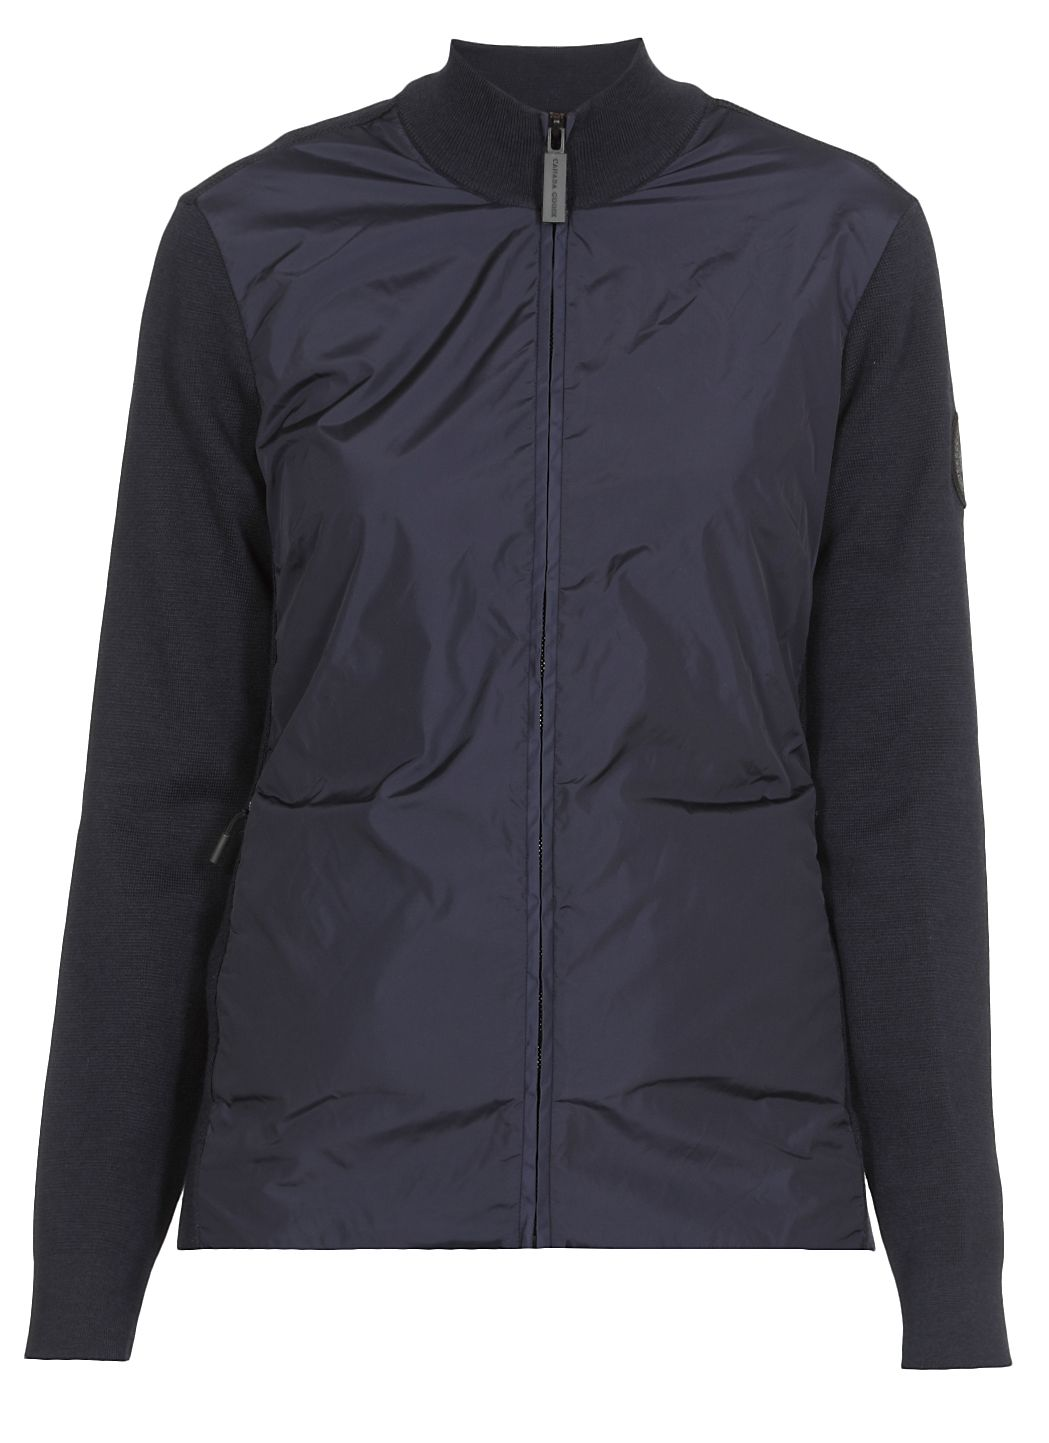 Windbridge Jacket